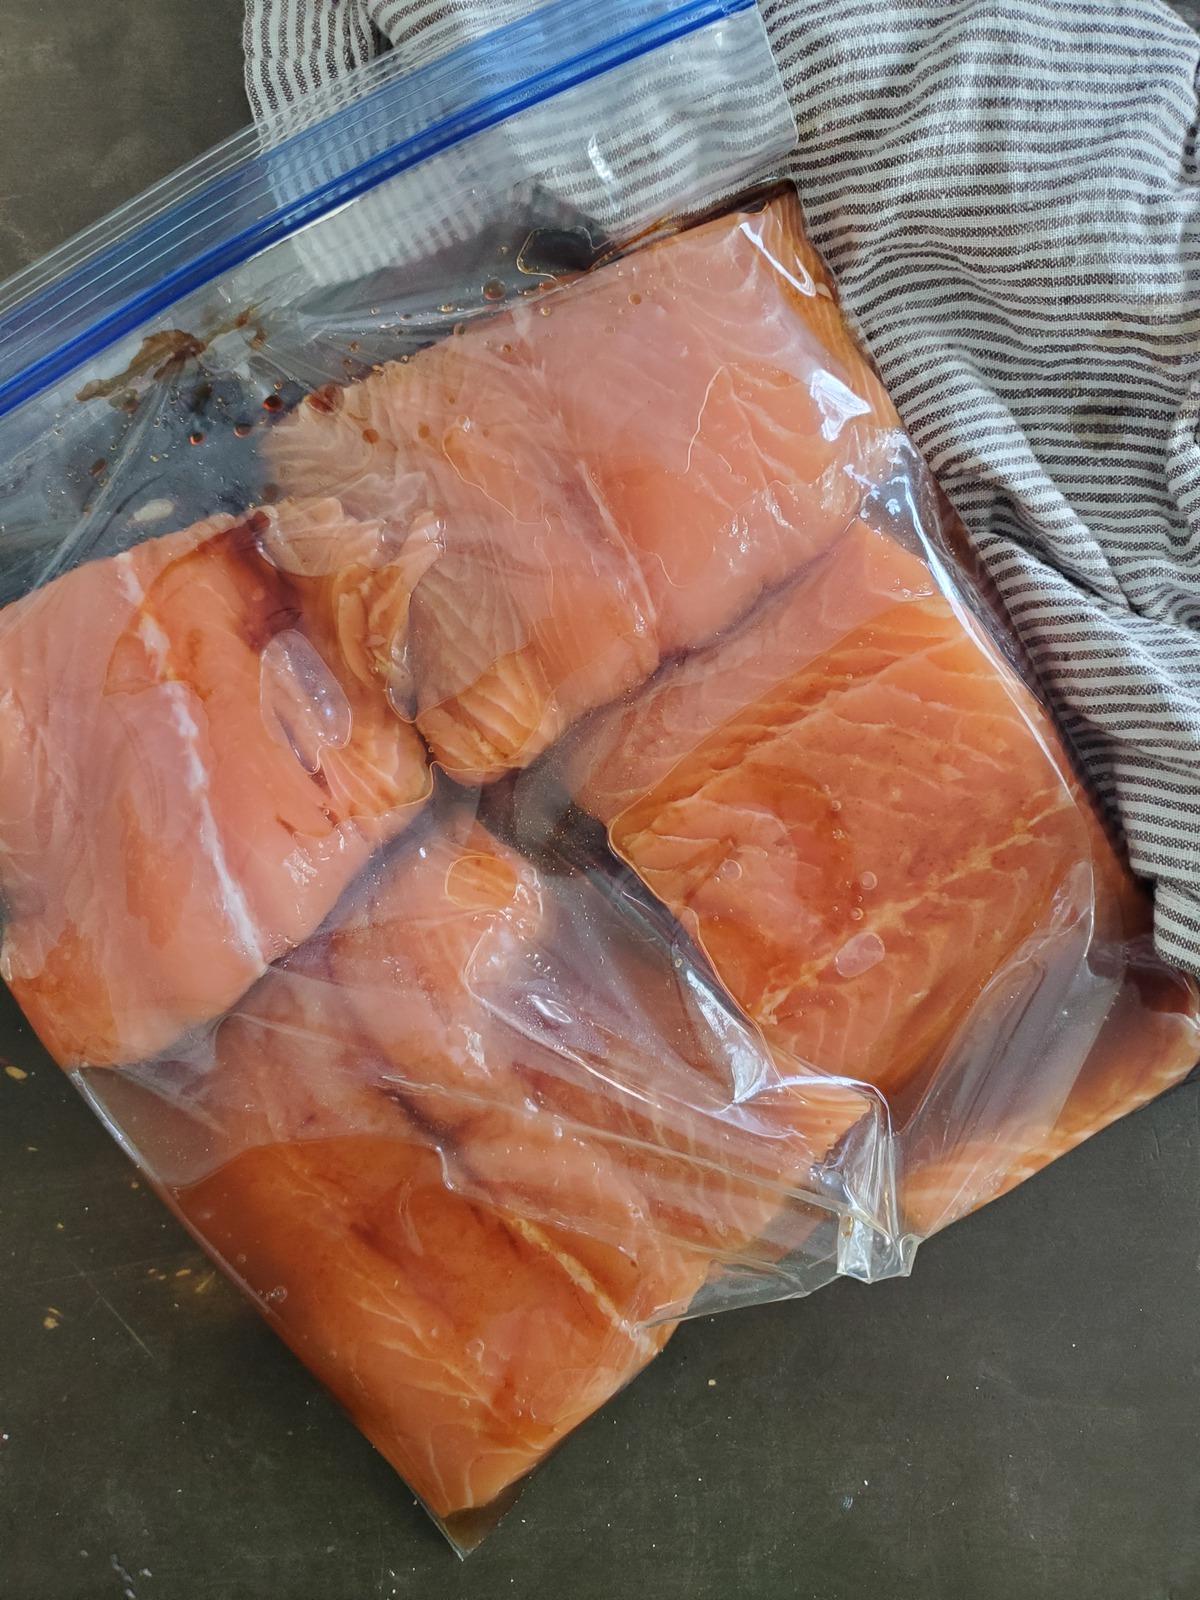 A ziplock bag of salmon marinating